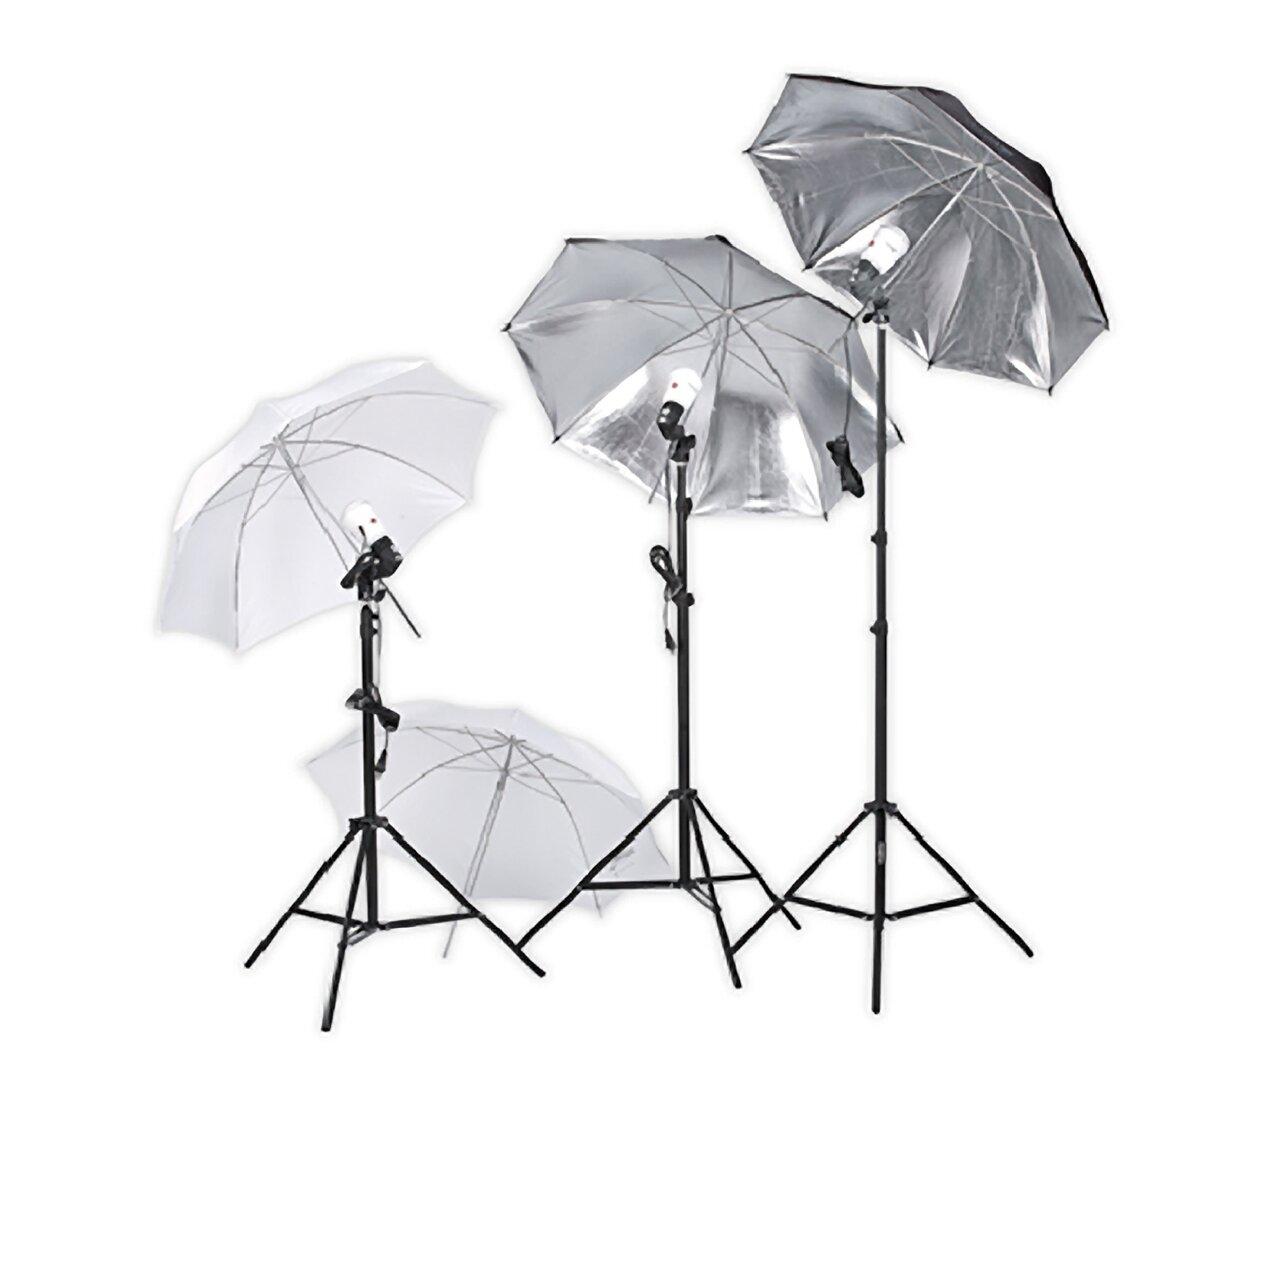 Square Perfect Professional Photography Studio Lighting